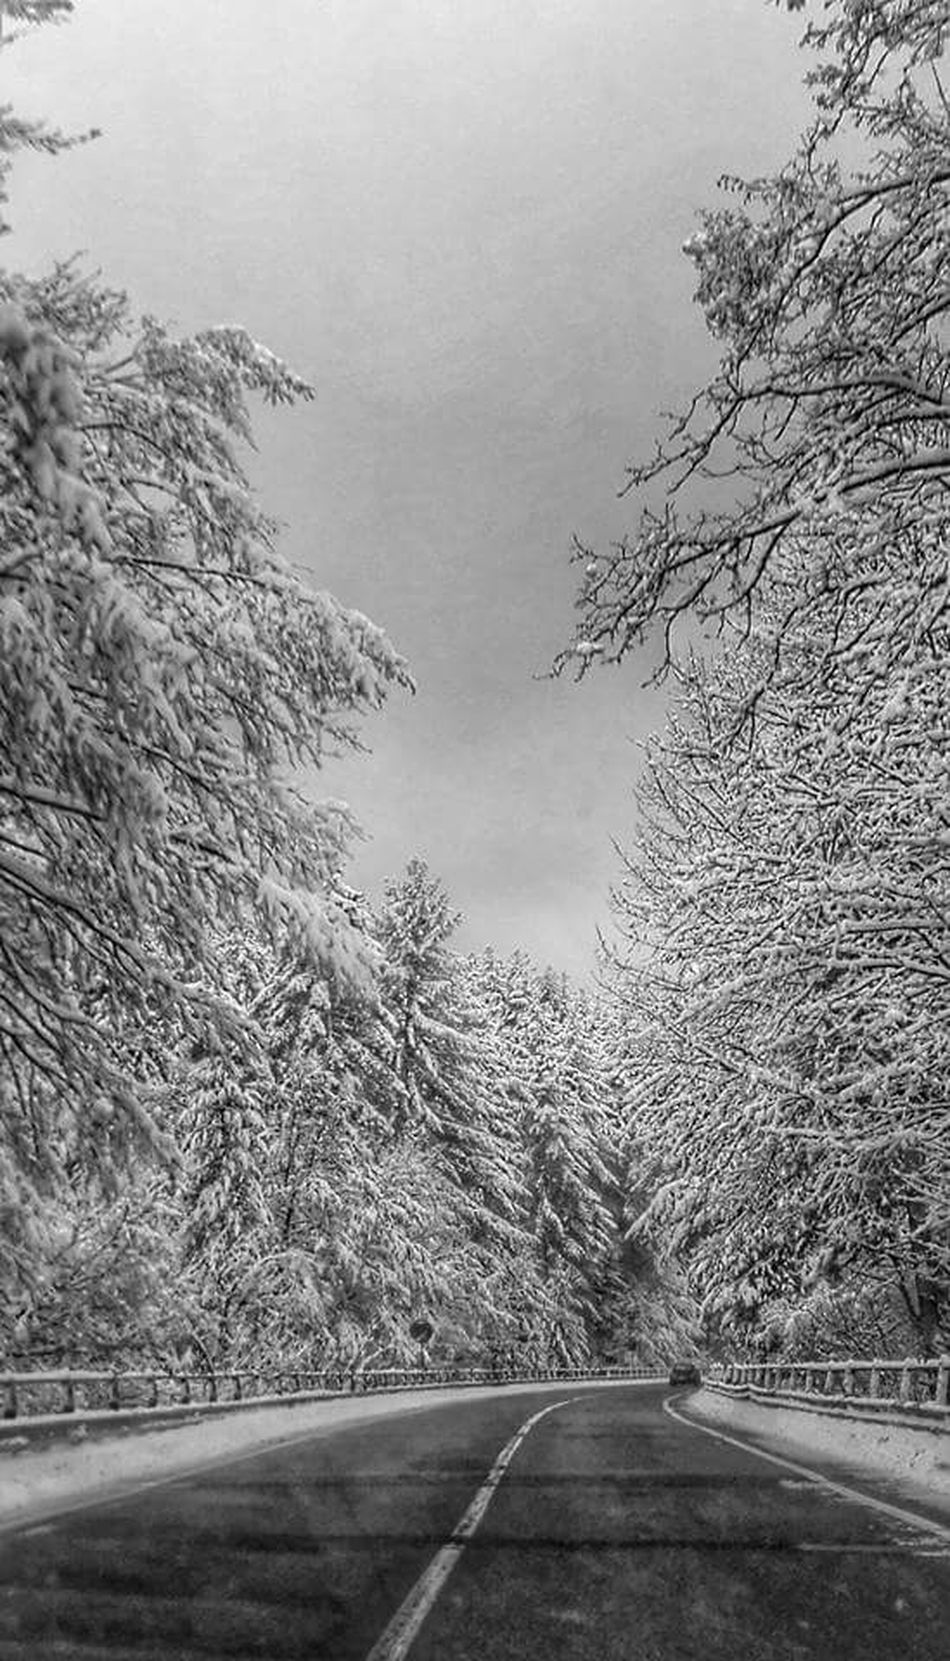 Paesaggiodasogno Calabria (Italy) Natural Simplicity Calabriadascoprire Paesaggio Invernale Paesaggio Malinconico Paesaggio Montano Natural Colors Calabriadaamare Paesaggiocalabrese Paesaggioitaliano Natural Photography